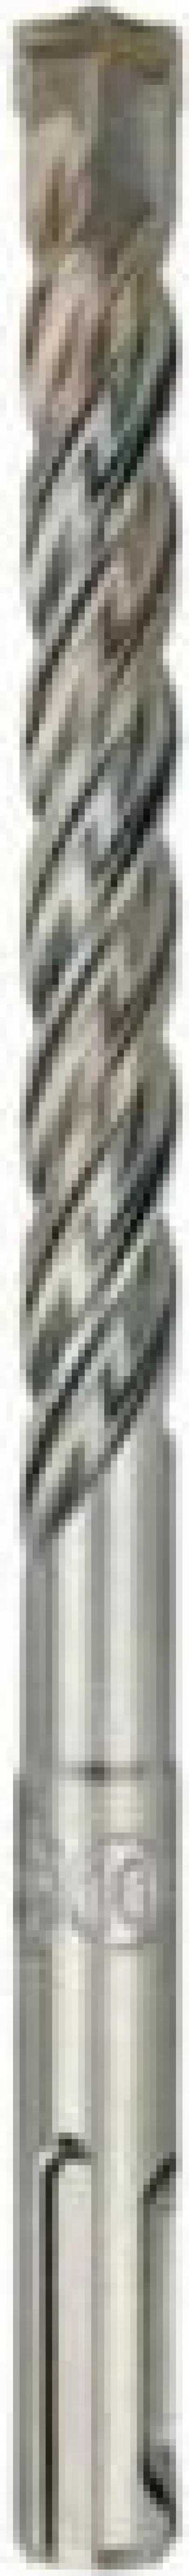 Burghiu SDS-plus EXTREME 2 6.5x100x160 mm Dewalt Accesorii masini de gaurit